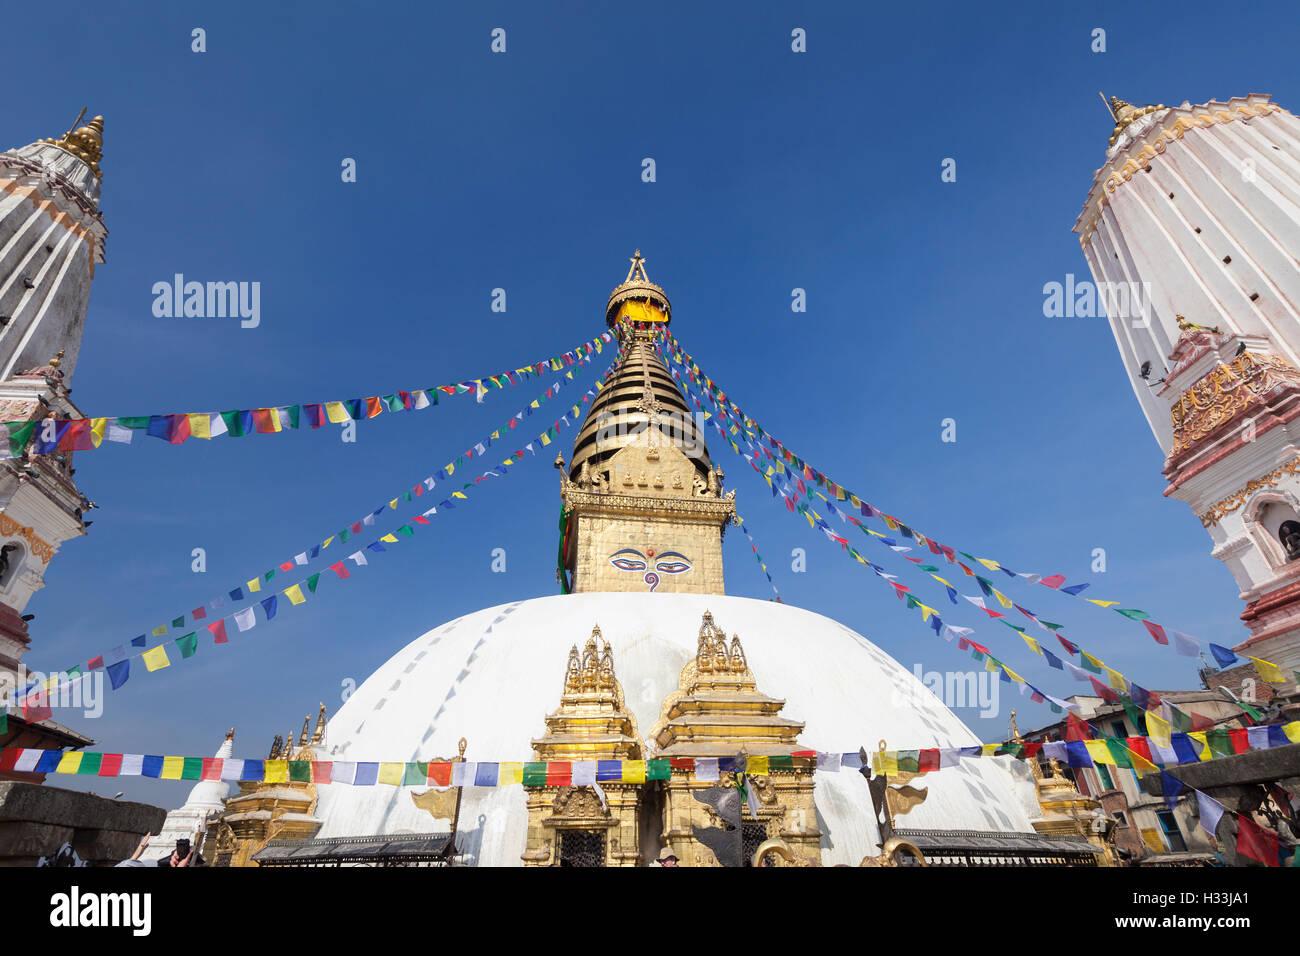 Swayambhunath temple, Kathmandu, Nepal - Stock Image